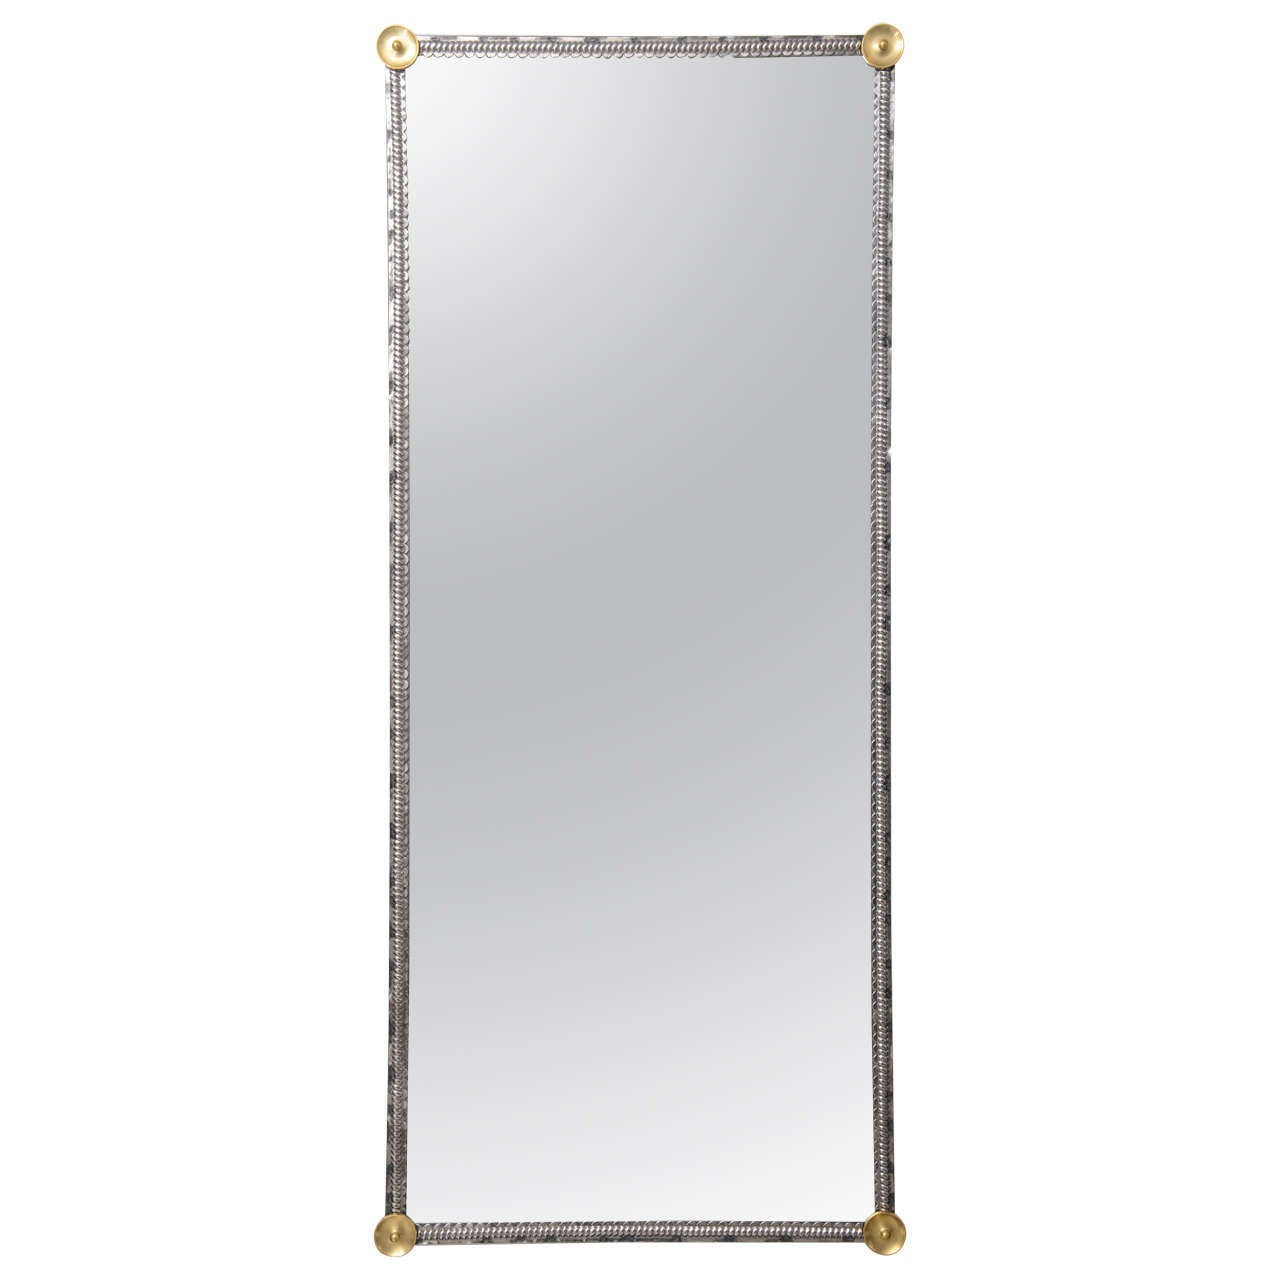 American Art Deco  Steel and Bronze Wall Mirror